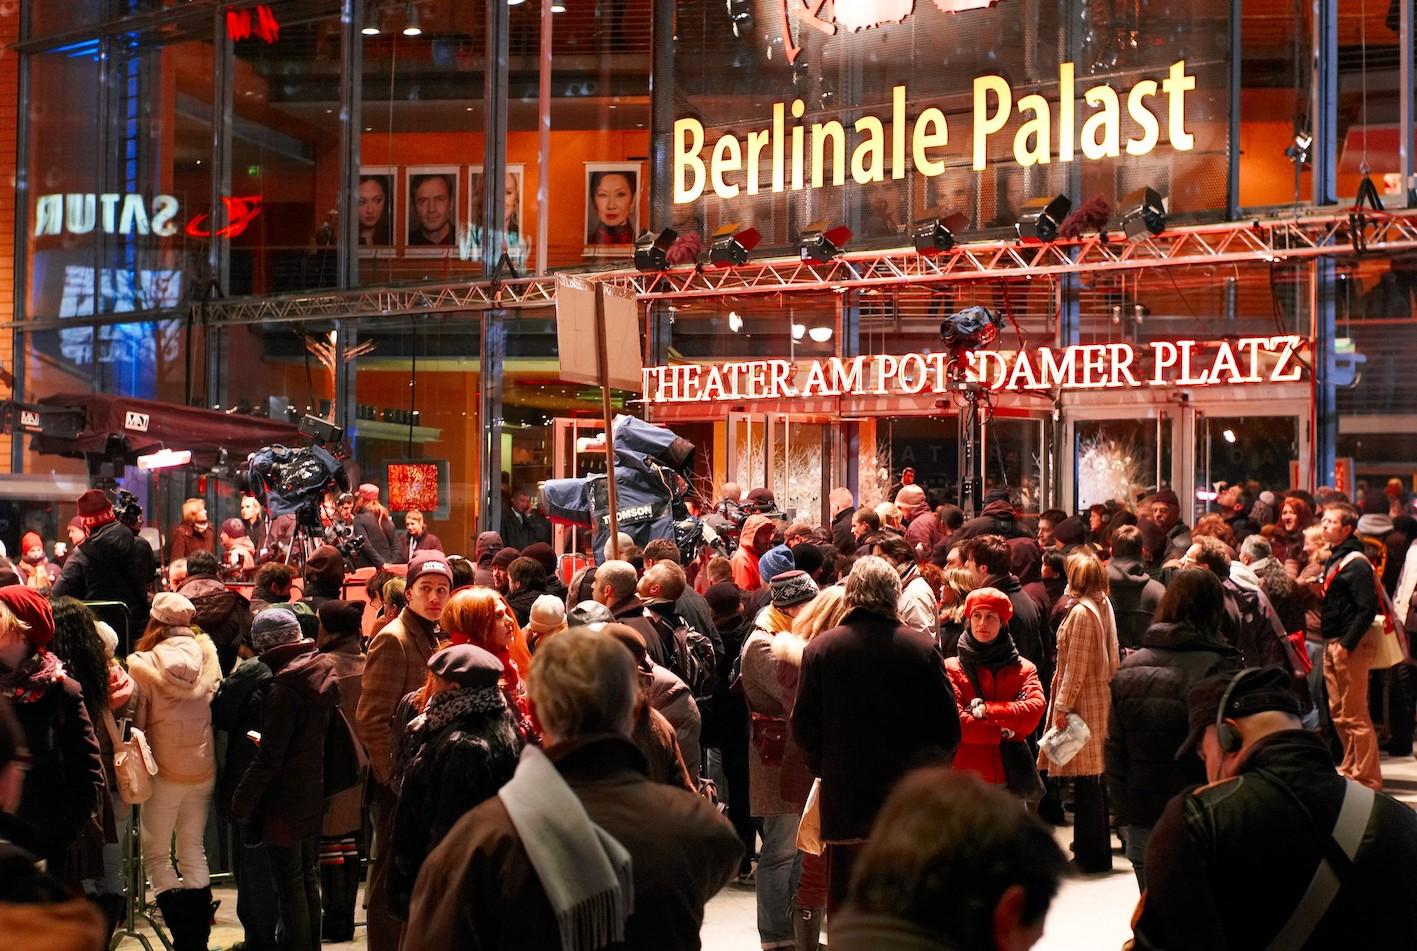 Artribune Artribune Sarà Come Come Berlinale Artribune Berlinale 2019 Berlinale 2019 2019 Sarà Come Sarà 1OA6xnnBdq